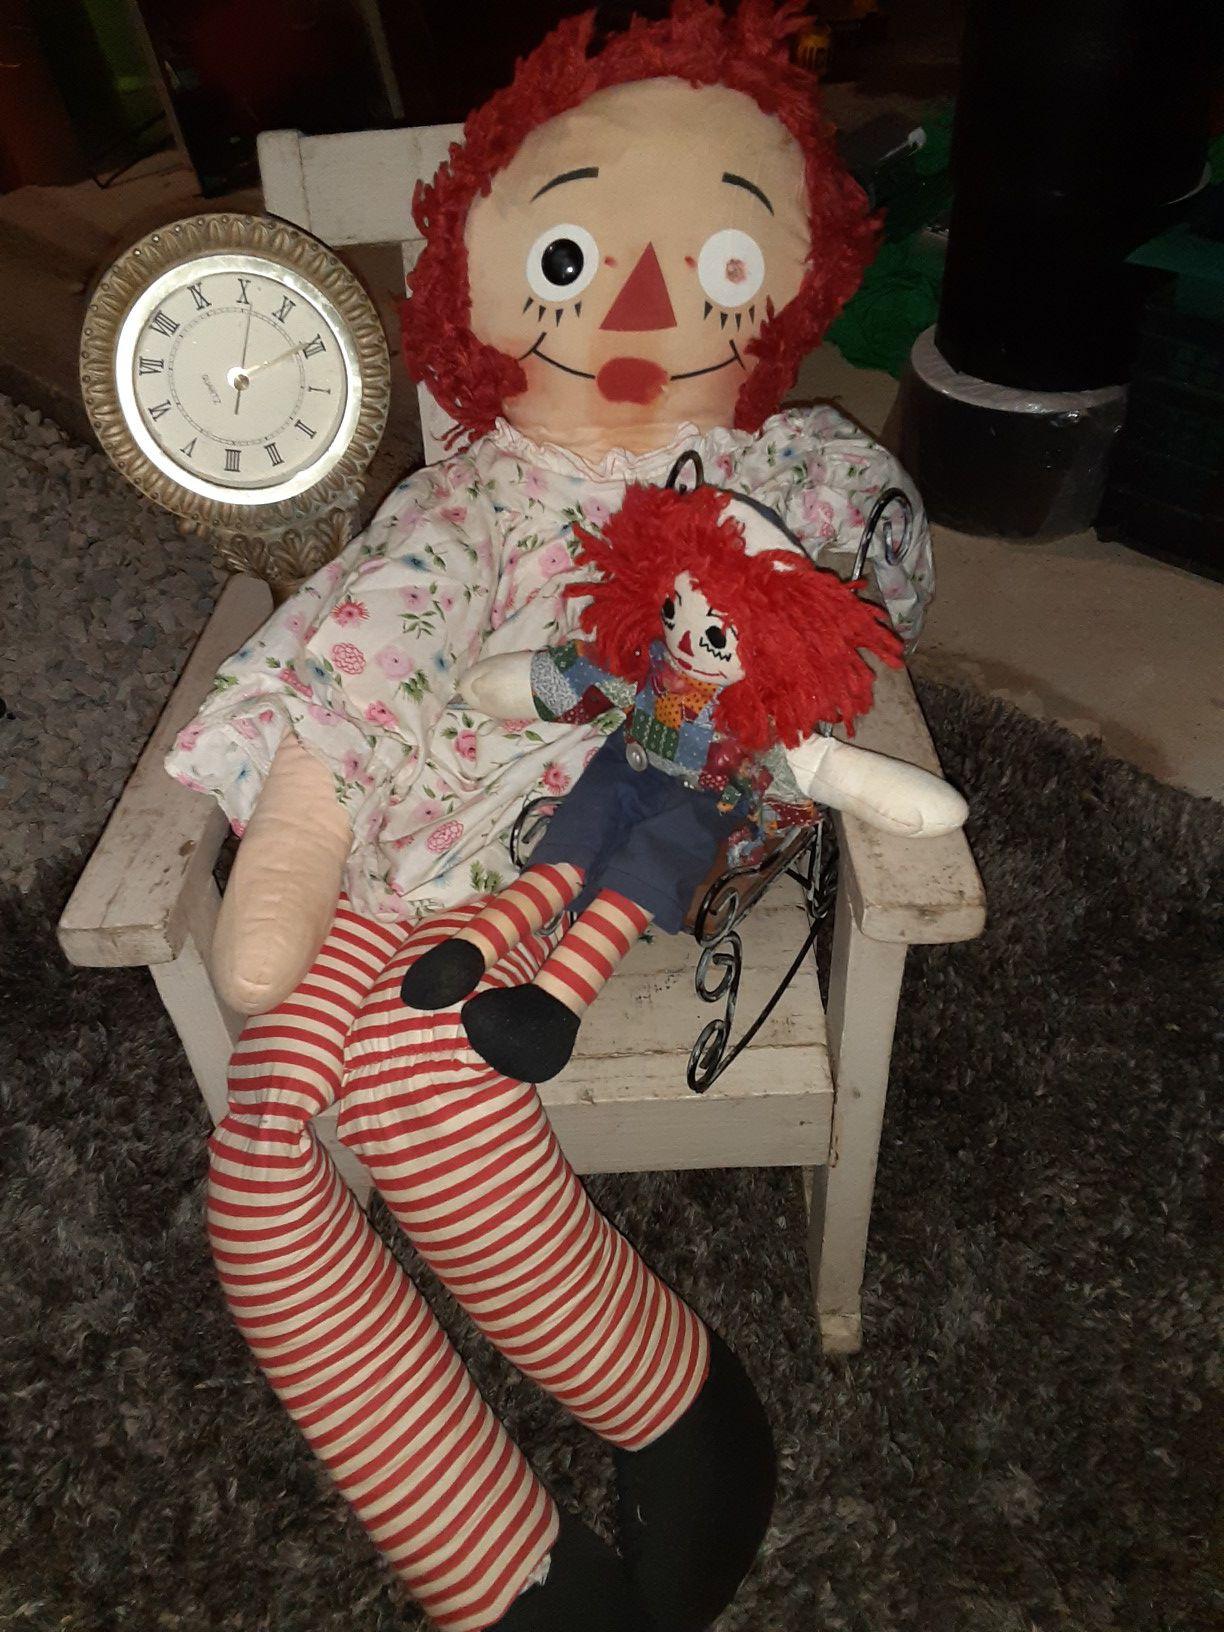 Raggedy Ann and Raggedy Andy dolls